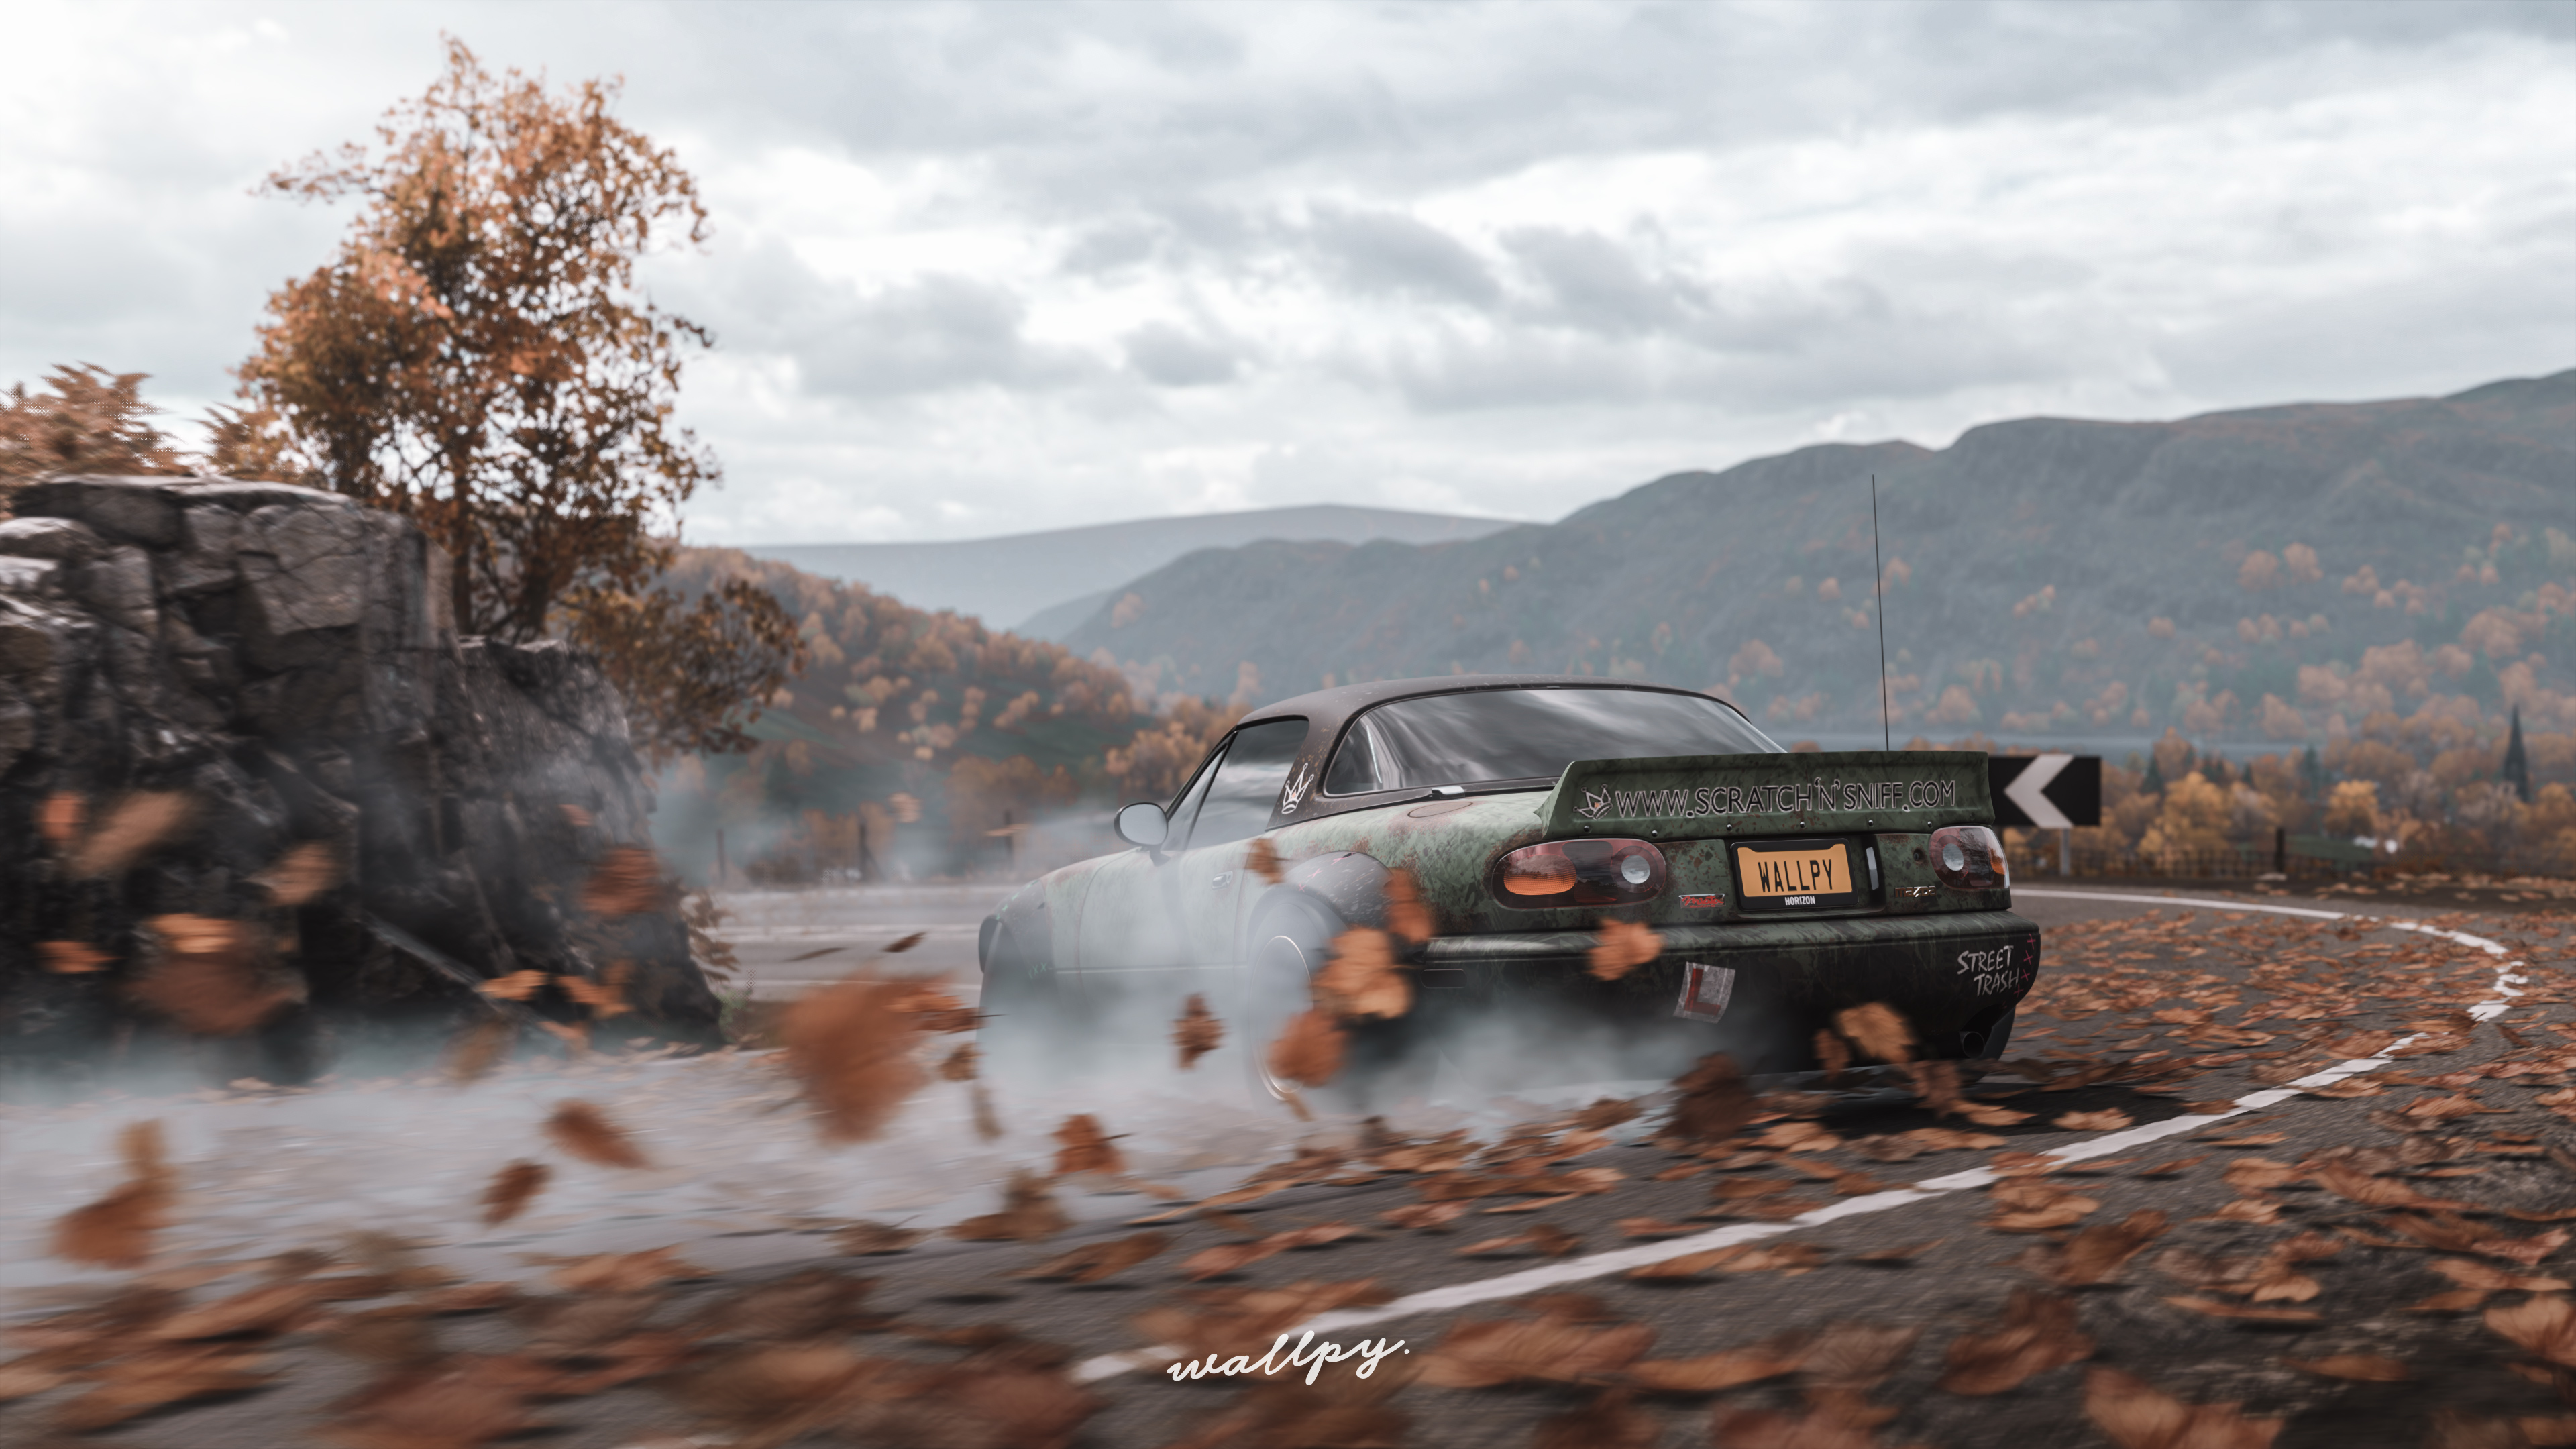 Forza Horizon 4 Wallpaper: Forza Horizon 4 Mazda Drift, HD Games, 4k Wallpapers